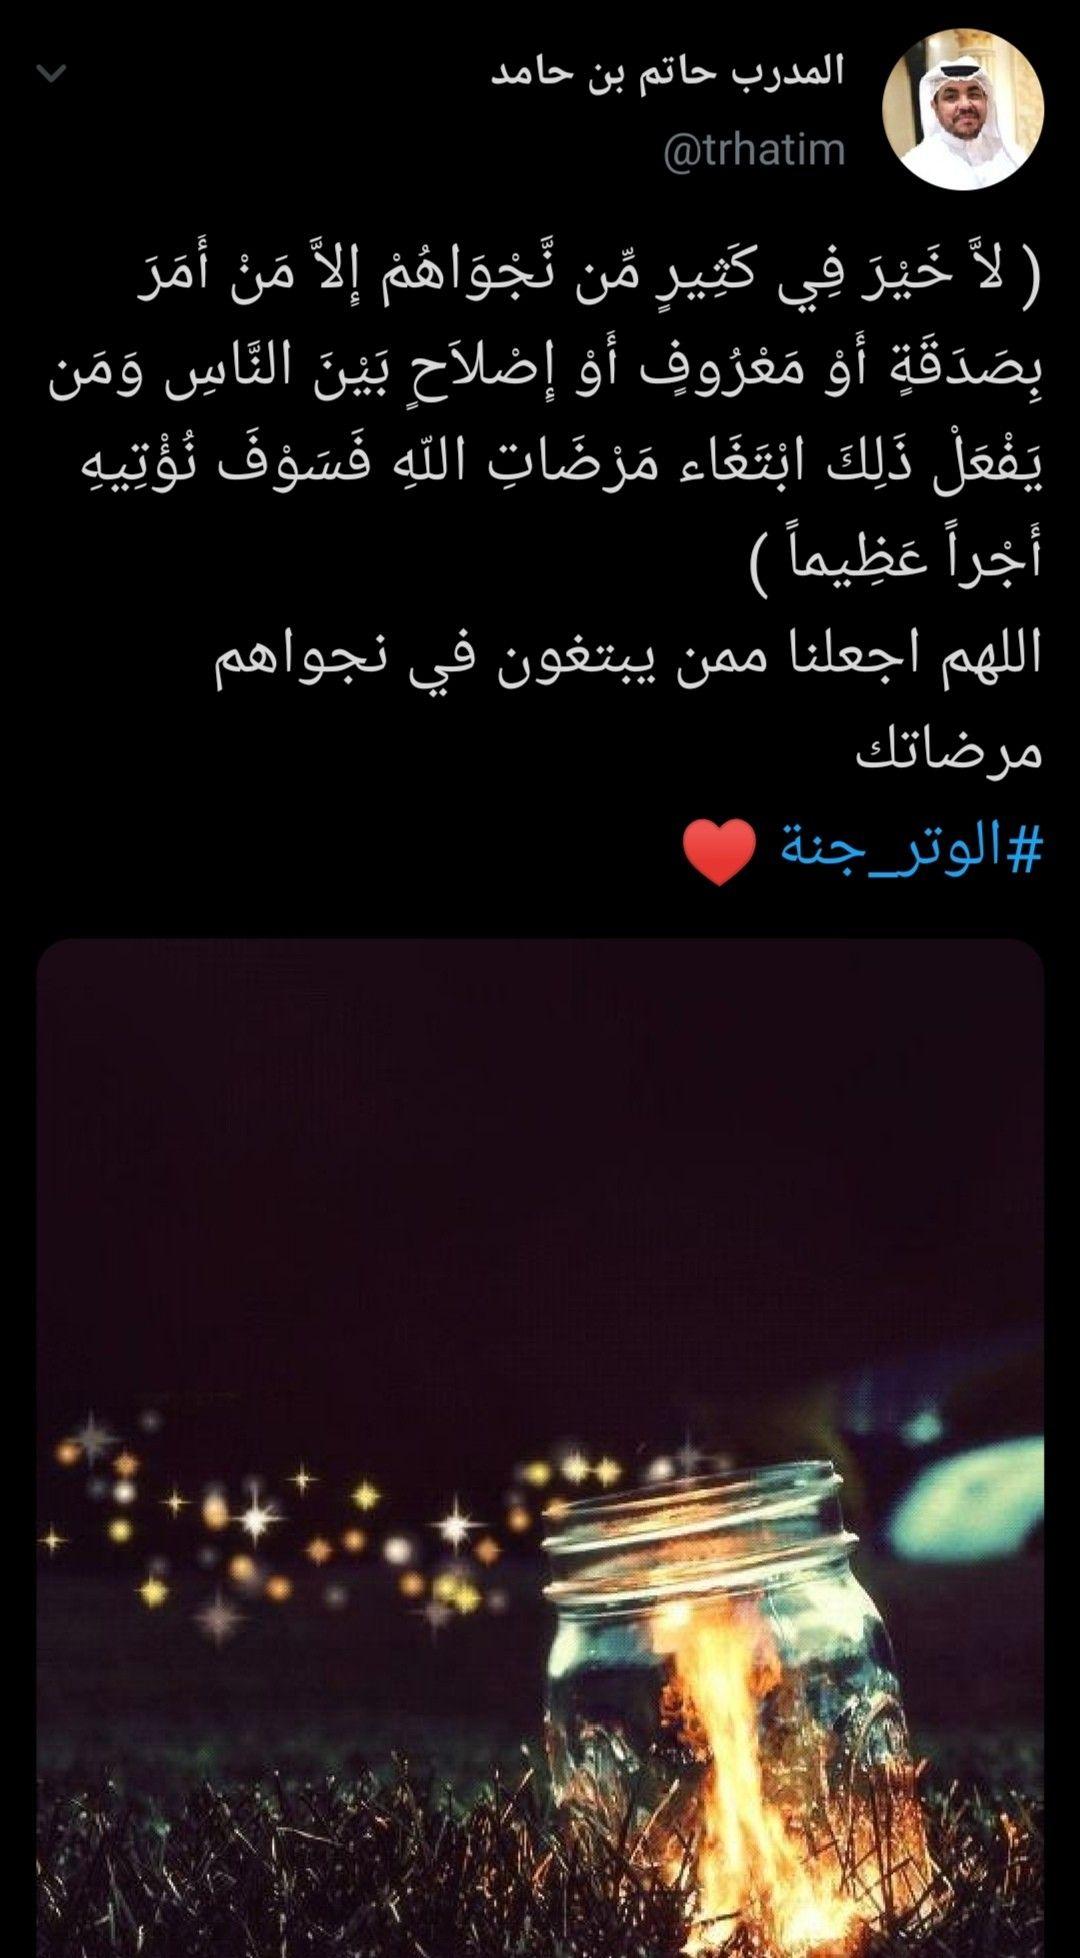 Pin By Hatim Bin Hamed On الوتر جنة القلوب Lockscreen Movie Posters Poster